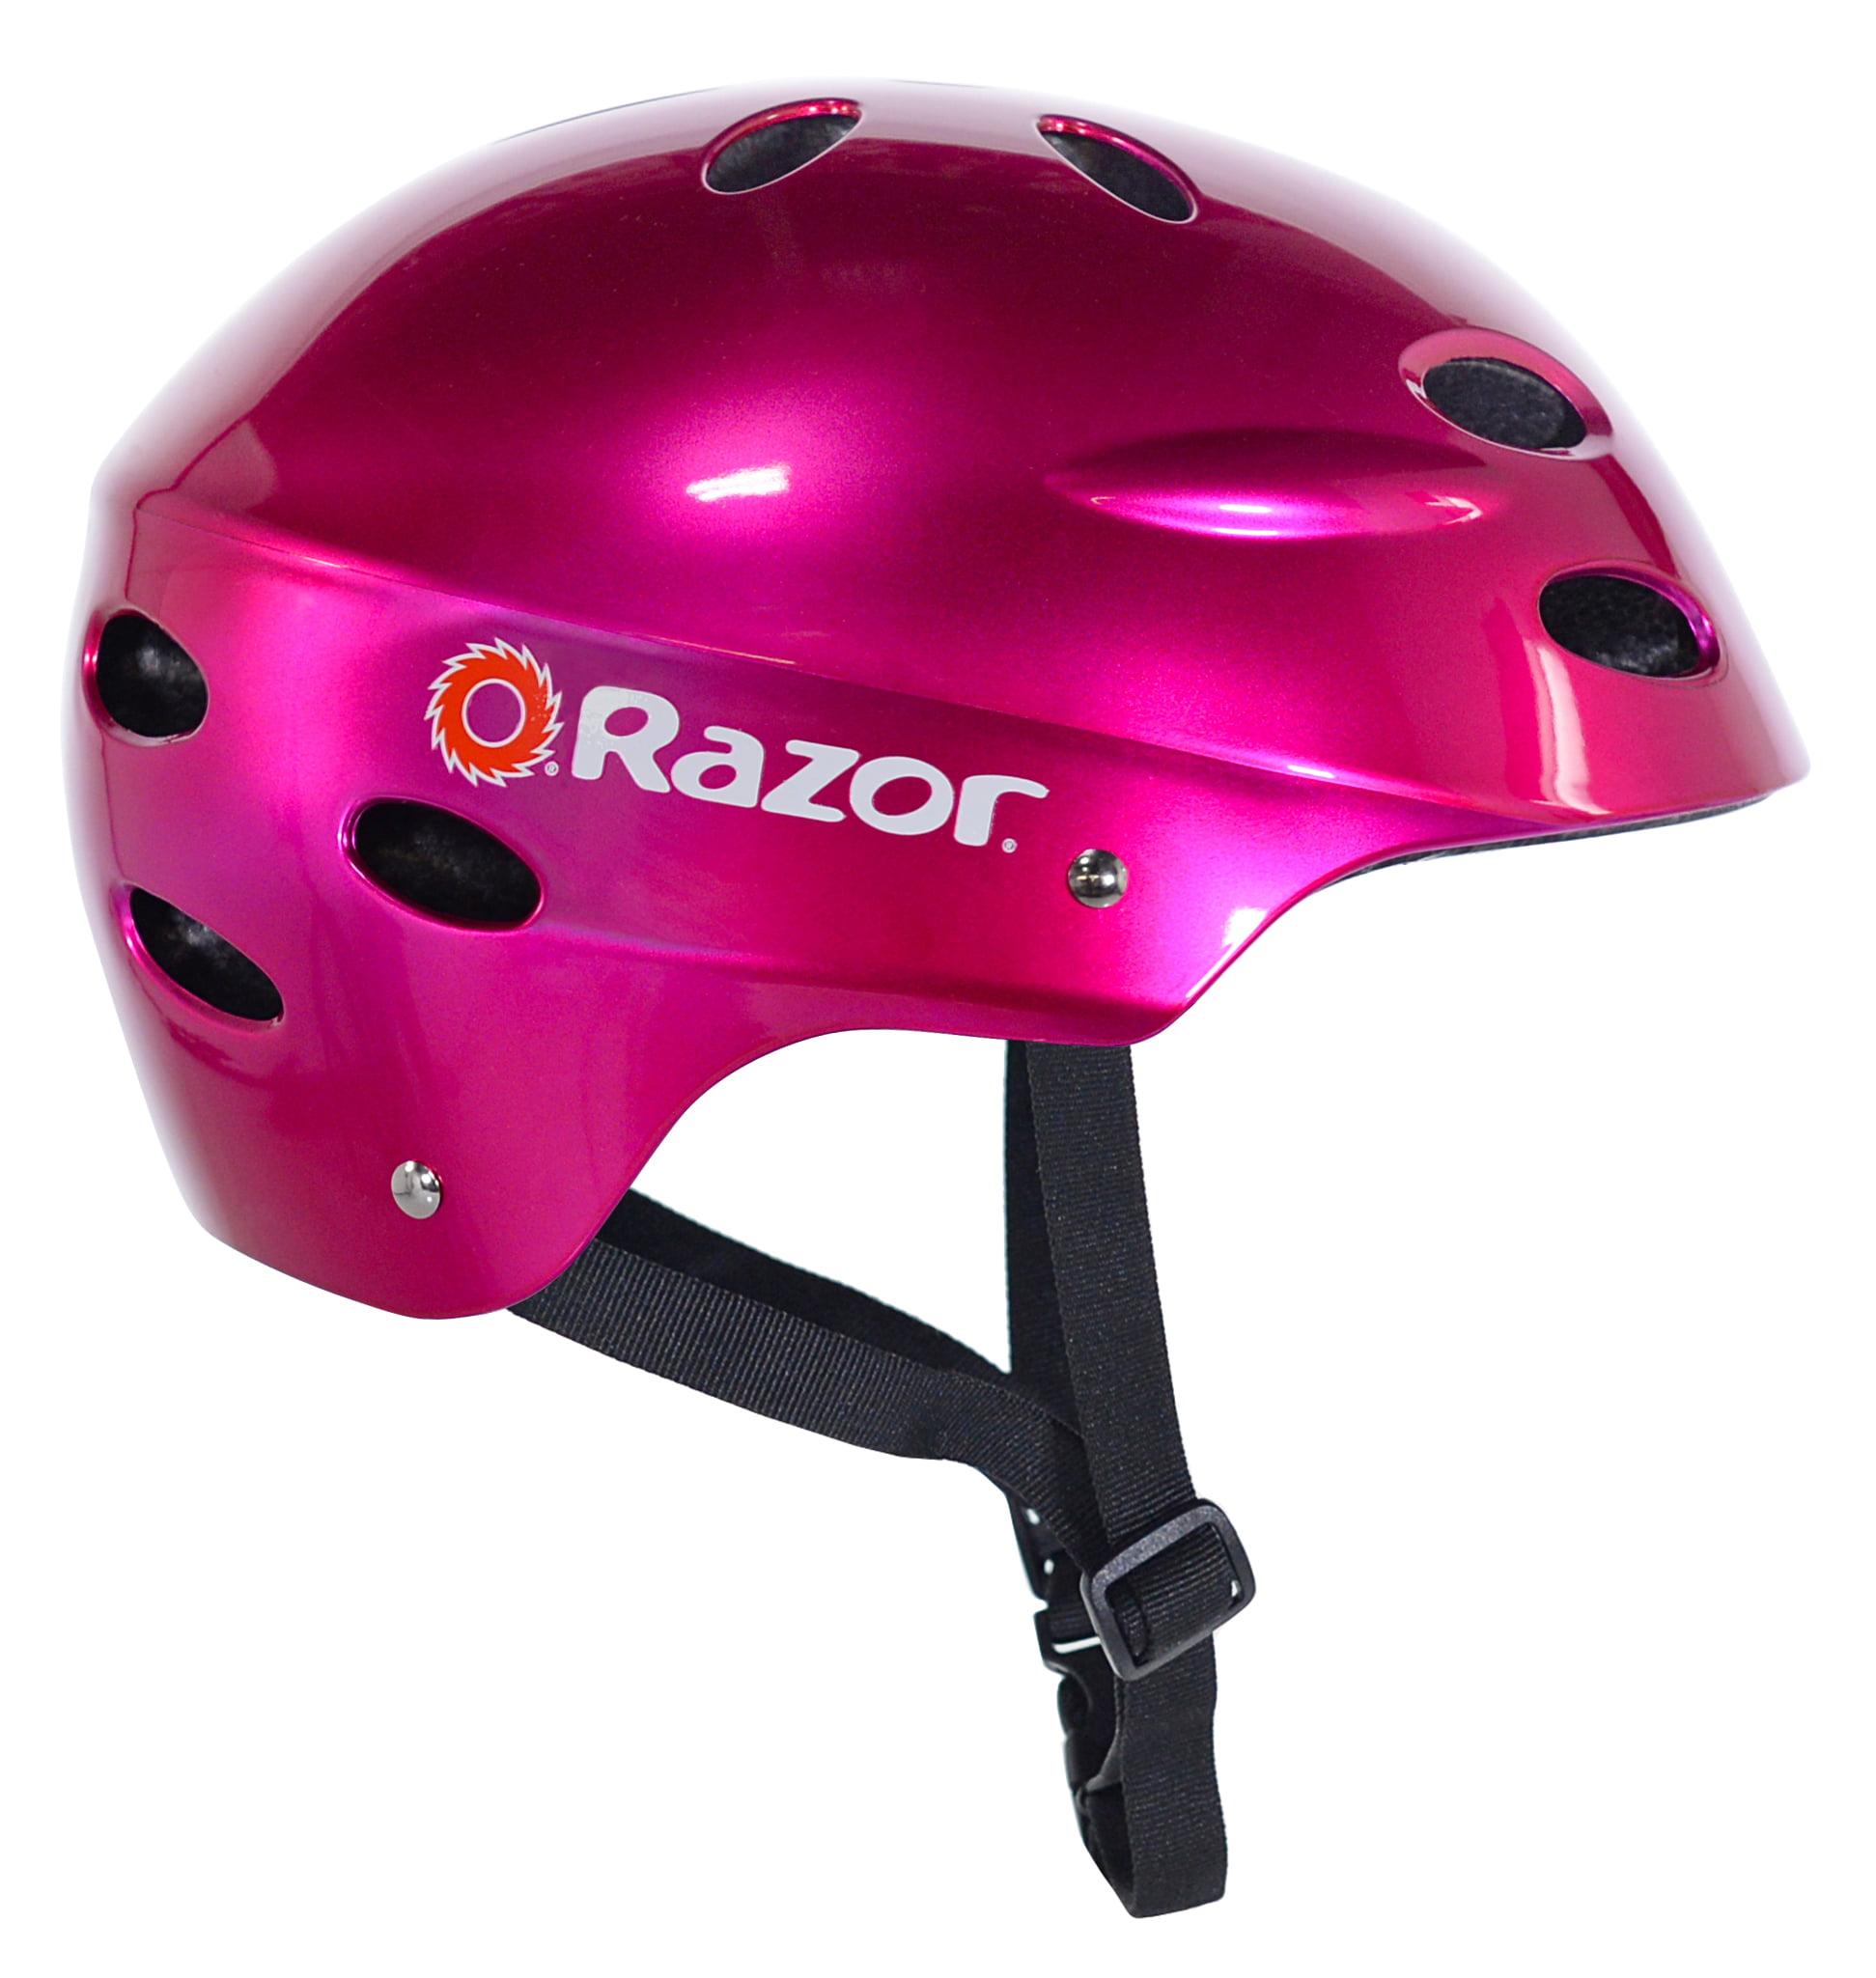 a490be2cfe6 Razor V17 Youth, Multi-Sport Helmet, Glossy Black, For Ages 8-14 -  Walmart.com